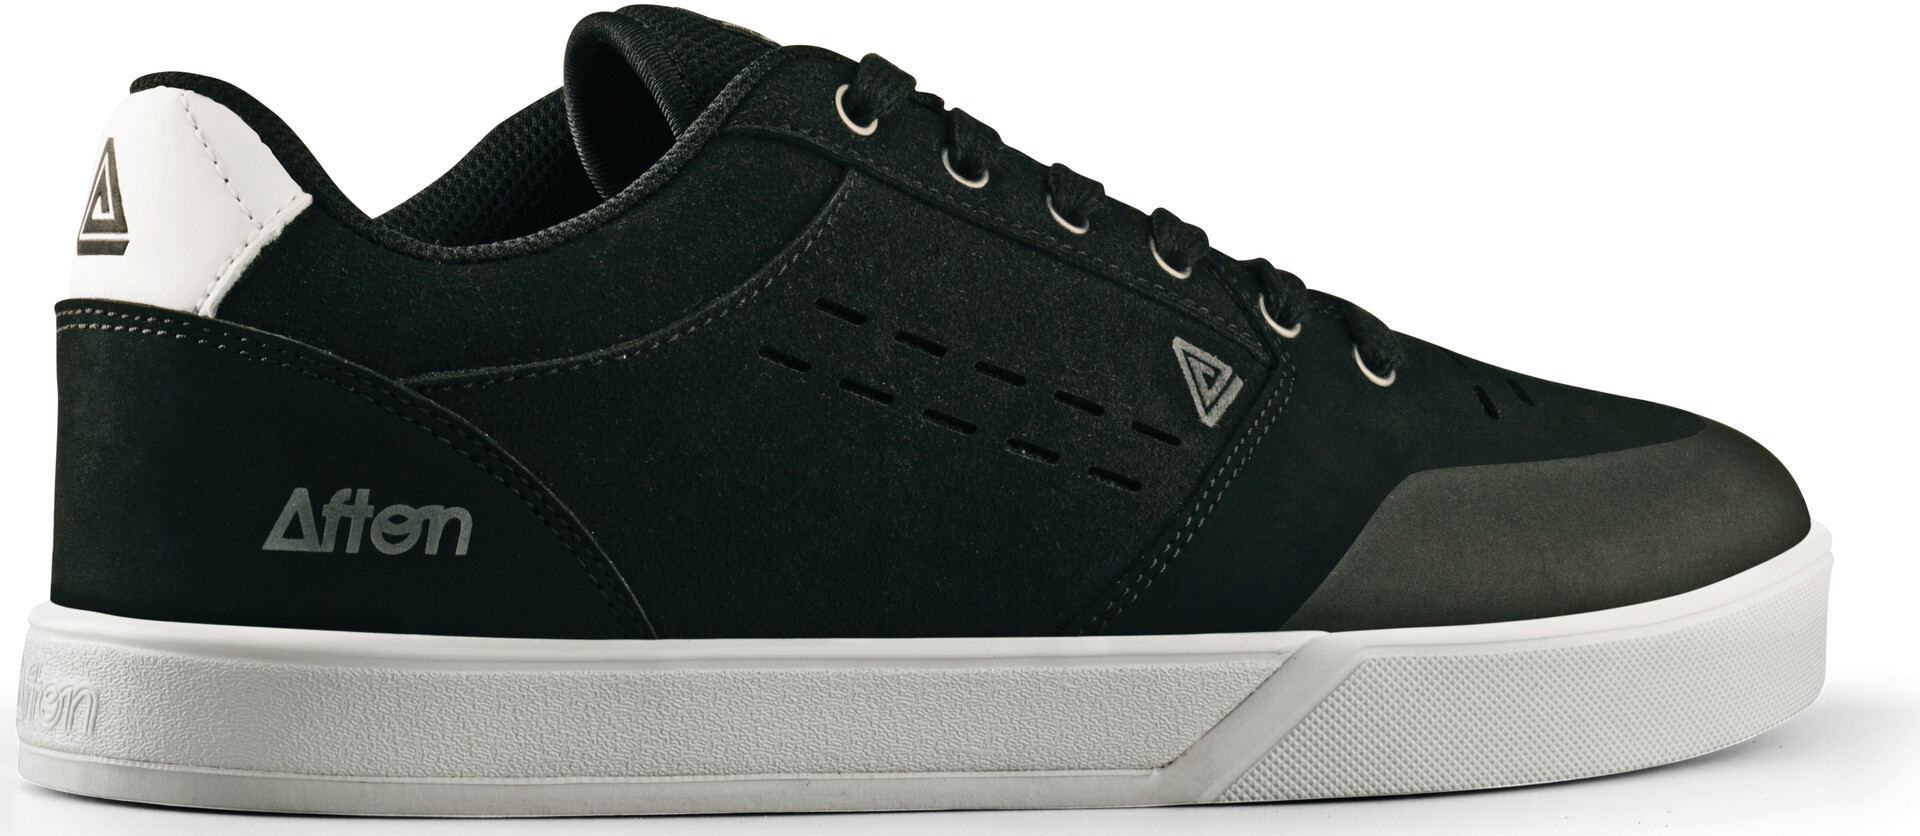 Afton Shoes Keegan Flatpedal Shoes Men blackgrey